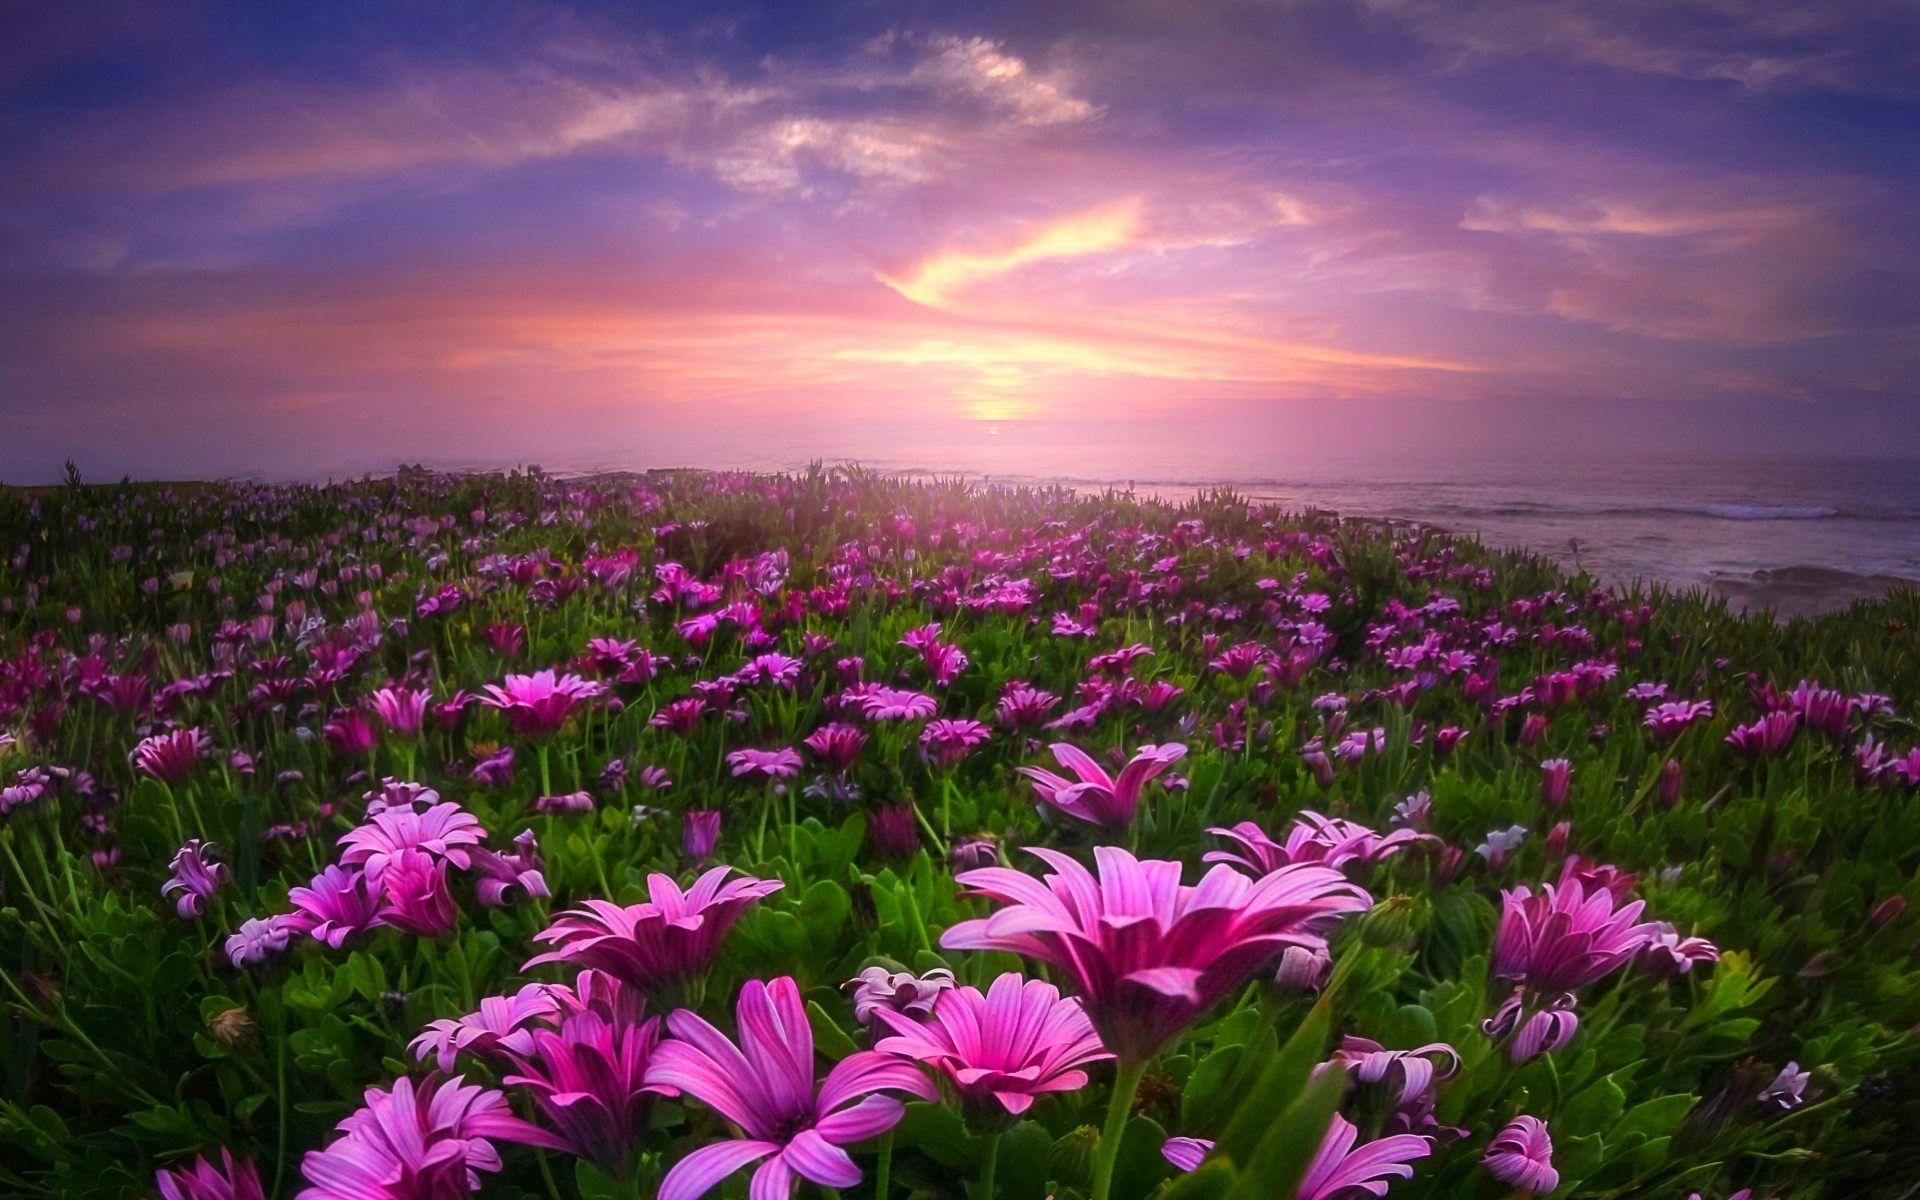 Field Of Daisies Hd Wallpaper For Desktop Of Flower Fields Flower Field Spring Flowers Background Beautiful Nature